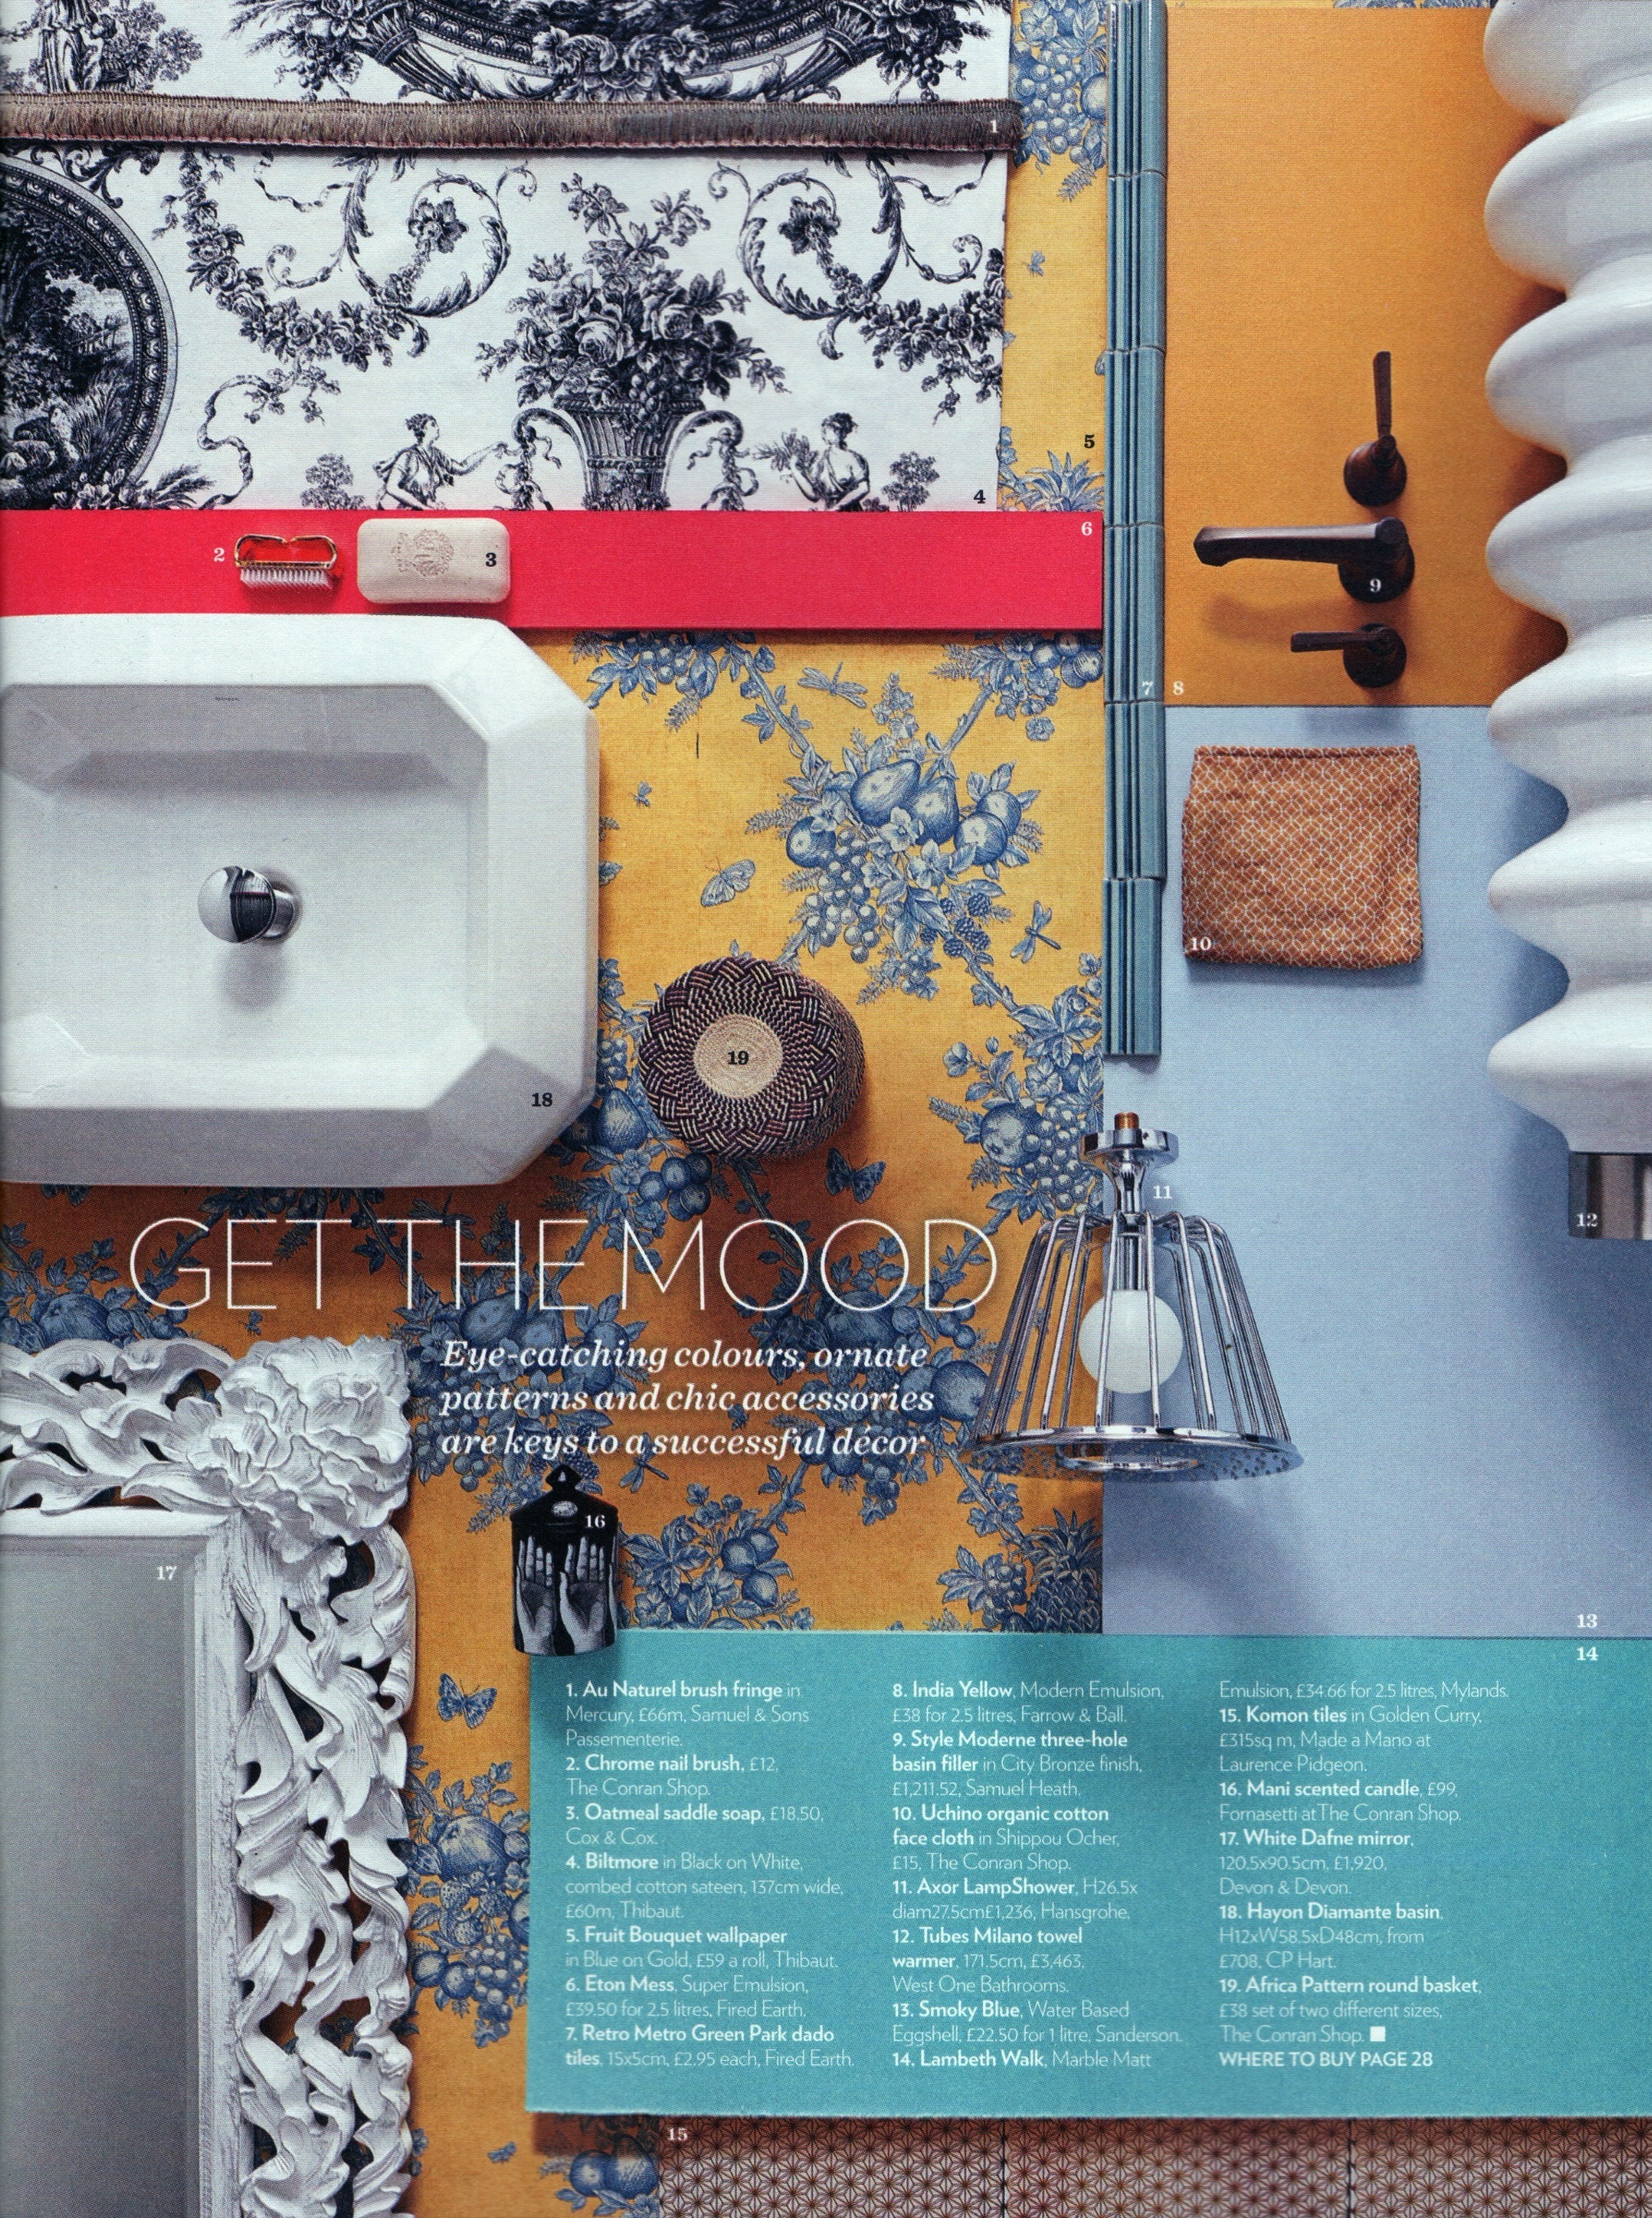 Decorative H&G bathrooms.jpeg